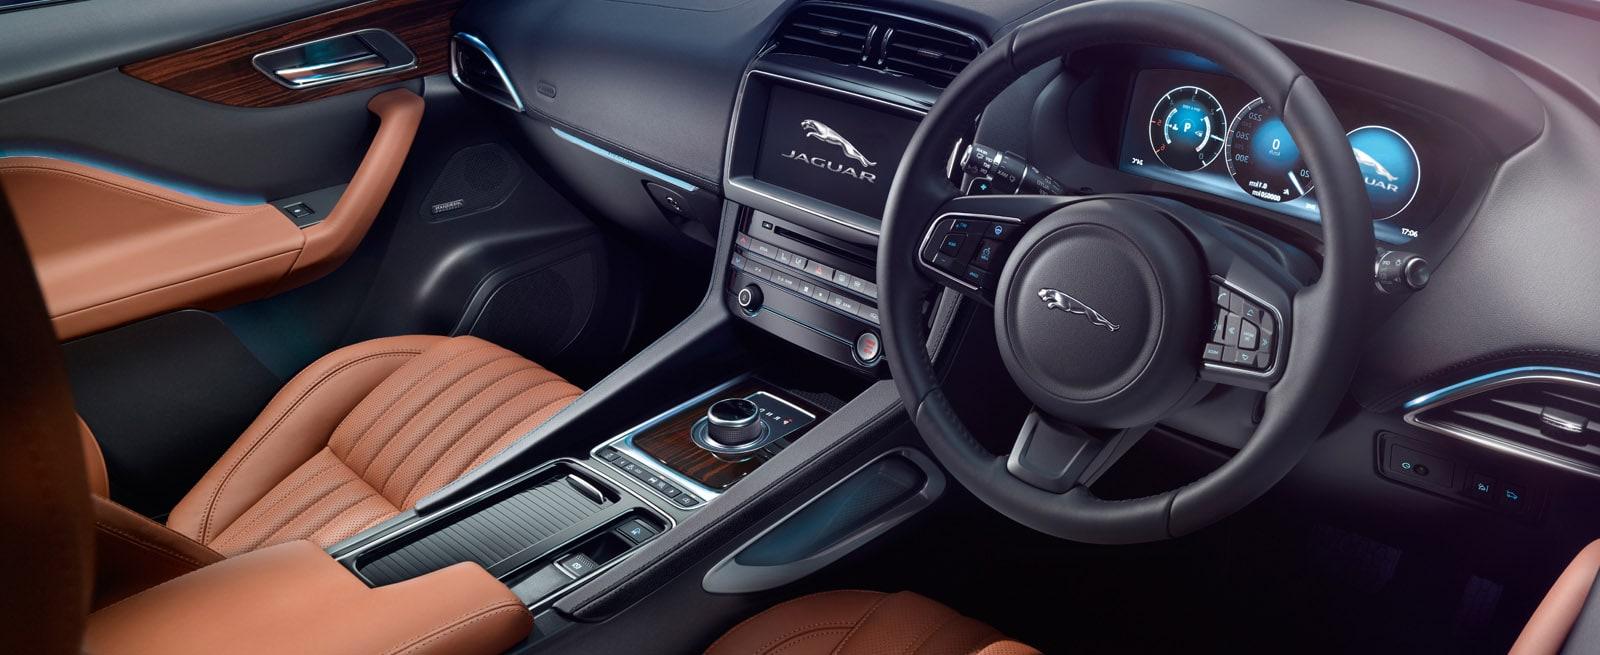 Interior of Jaguar F-Pace